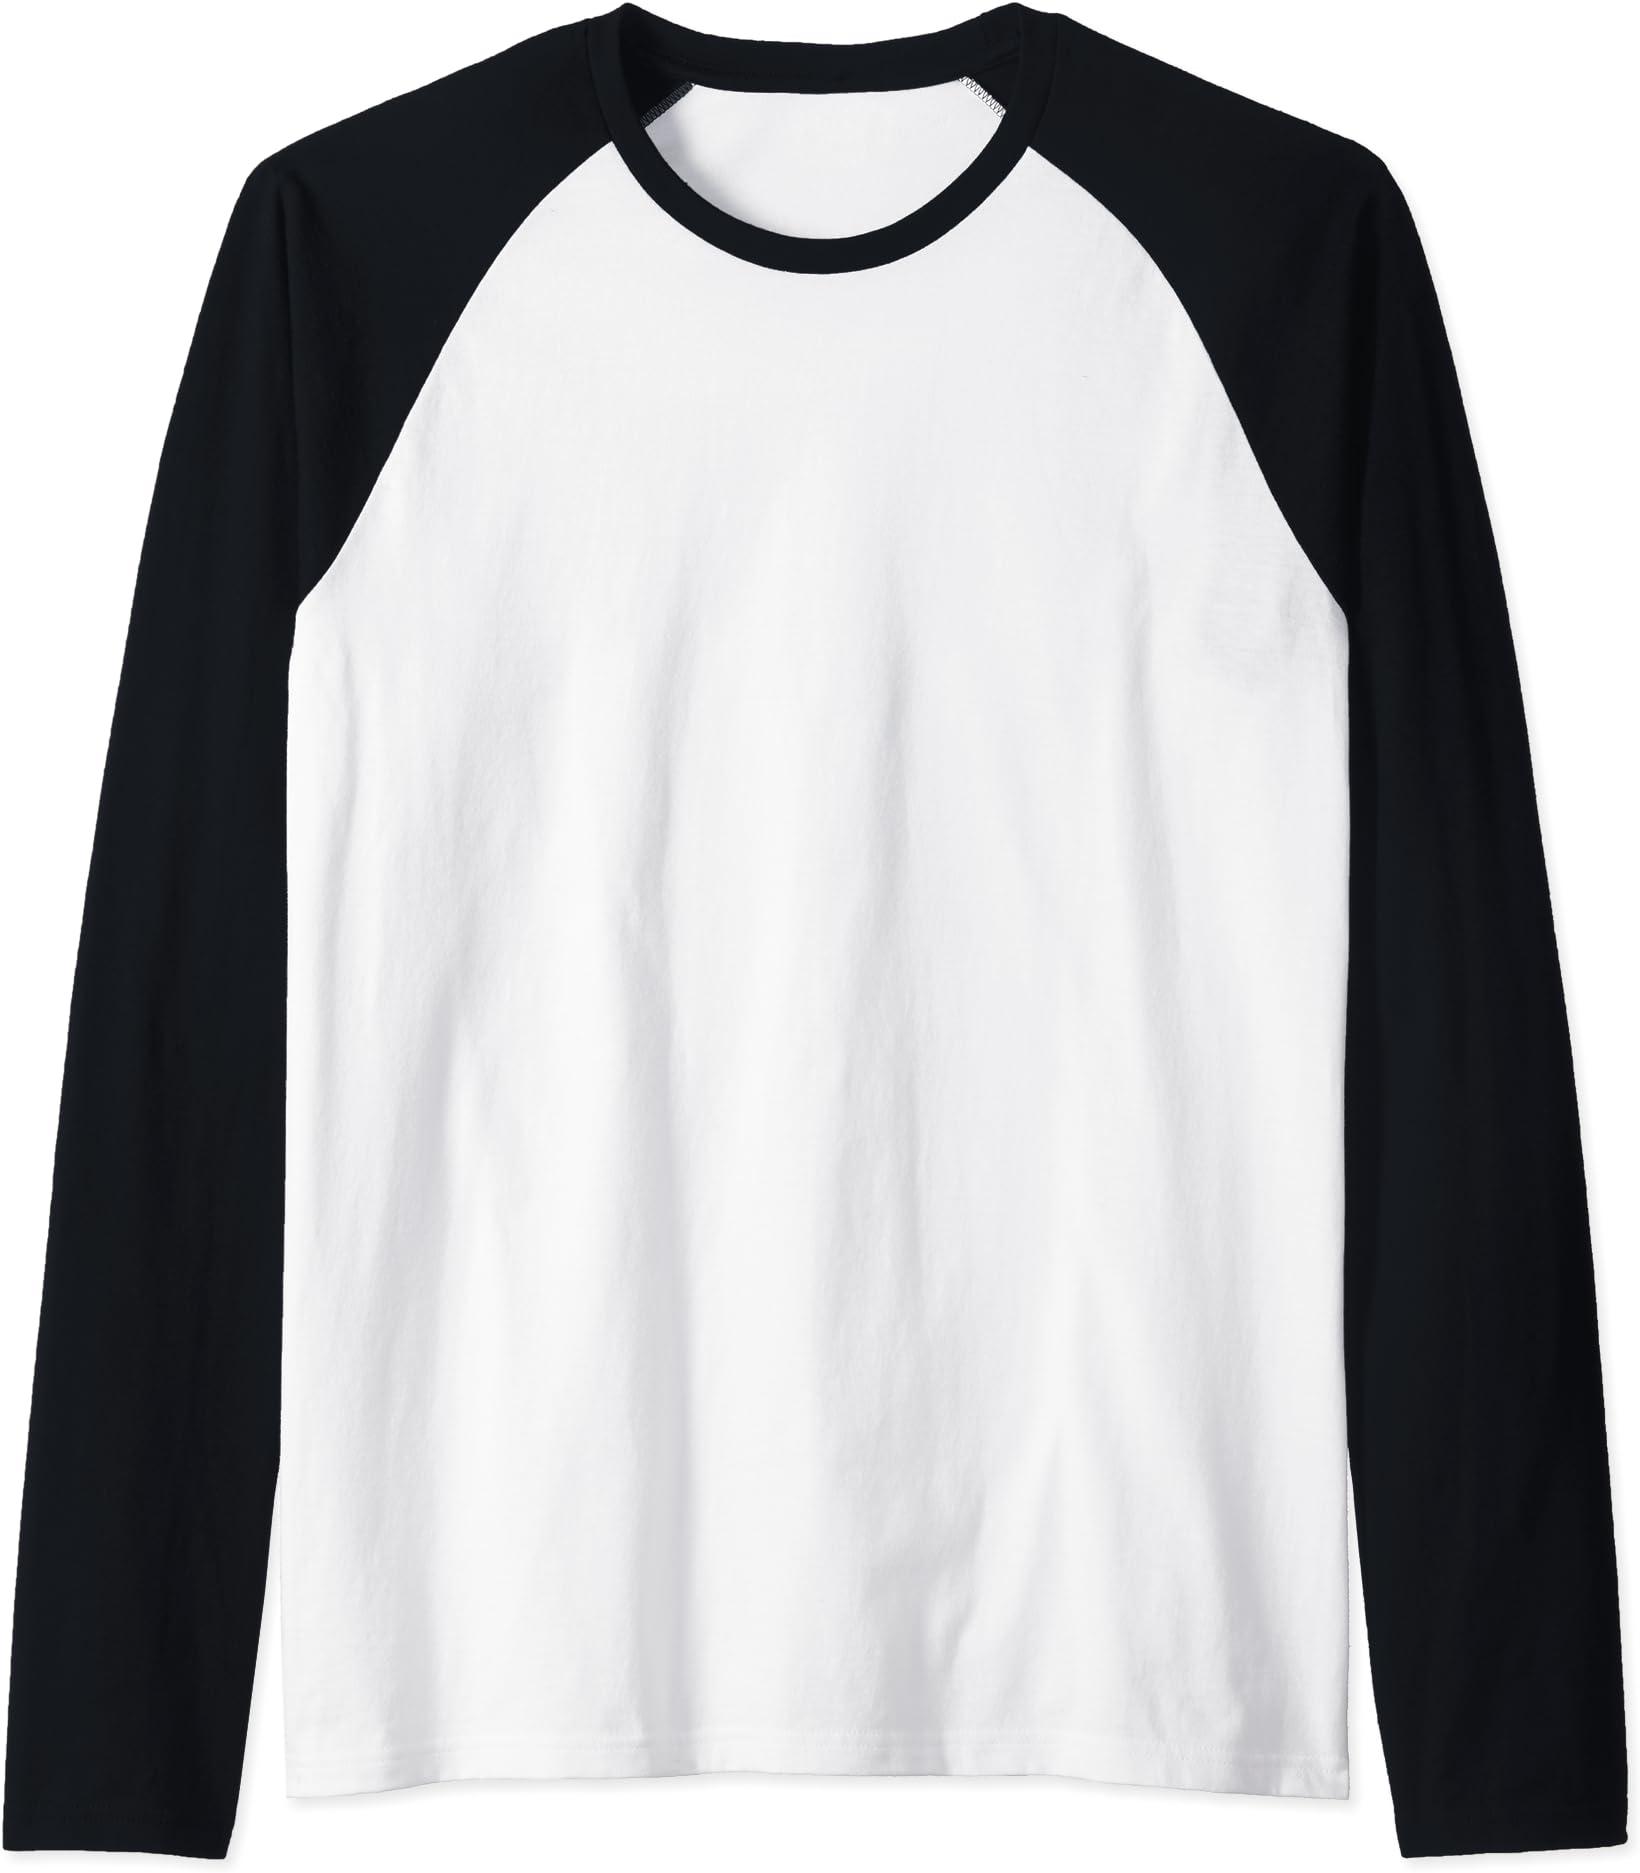 ST PAULI Campus Sweatjacket Black White